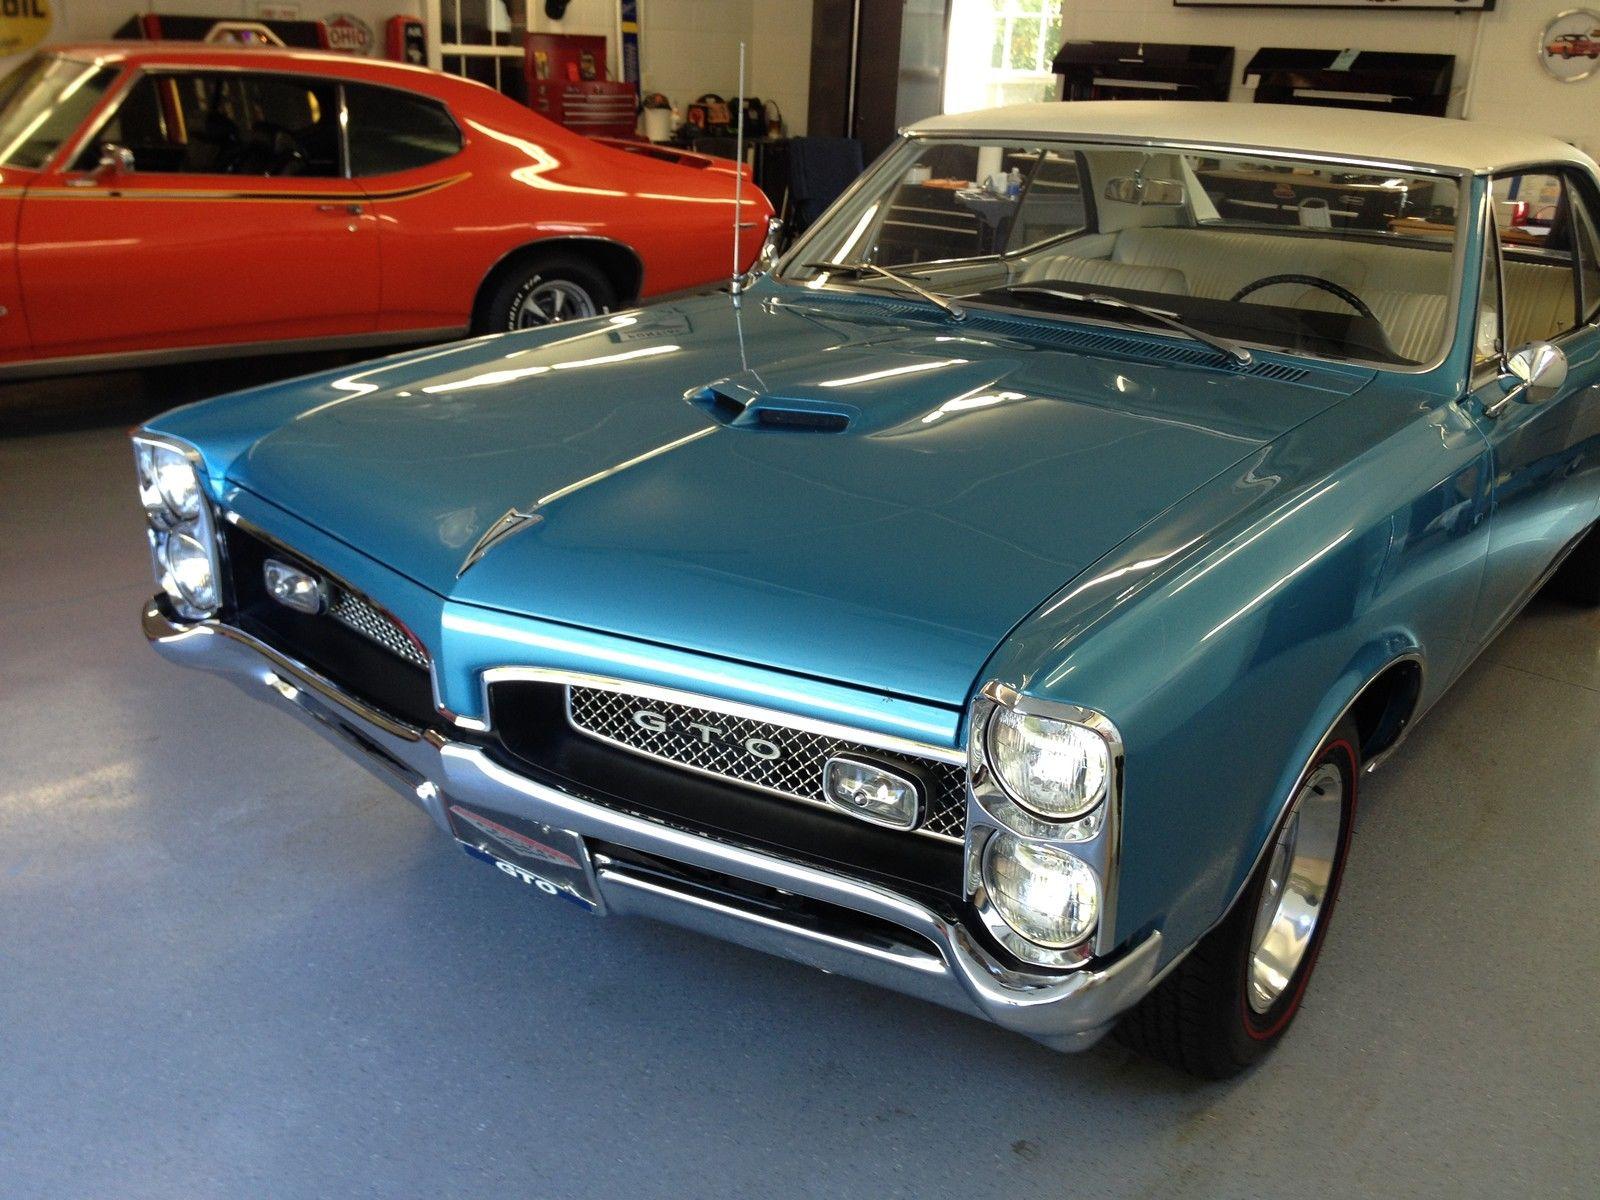 1967 Pontiac Gto Project Car